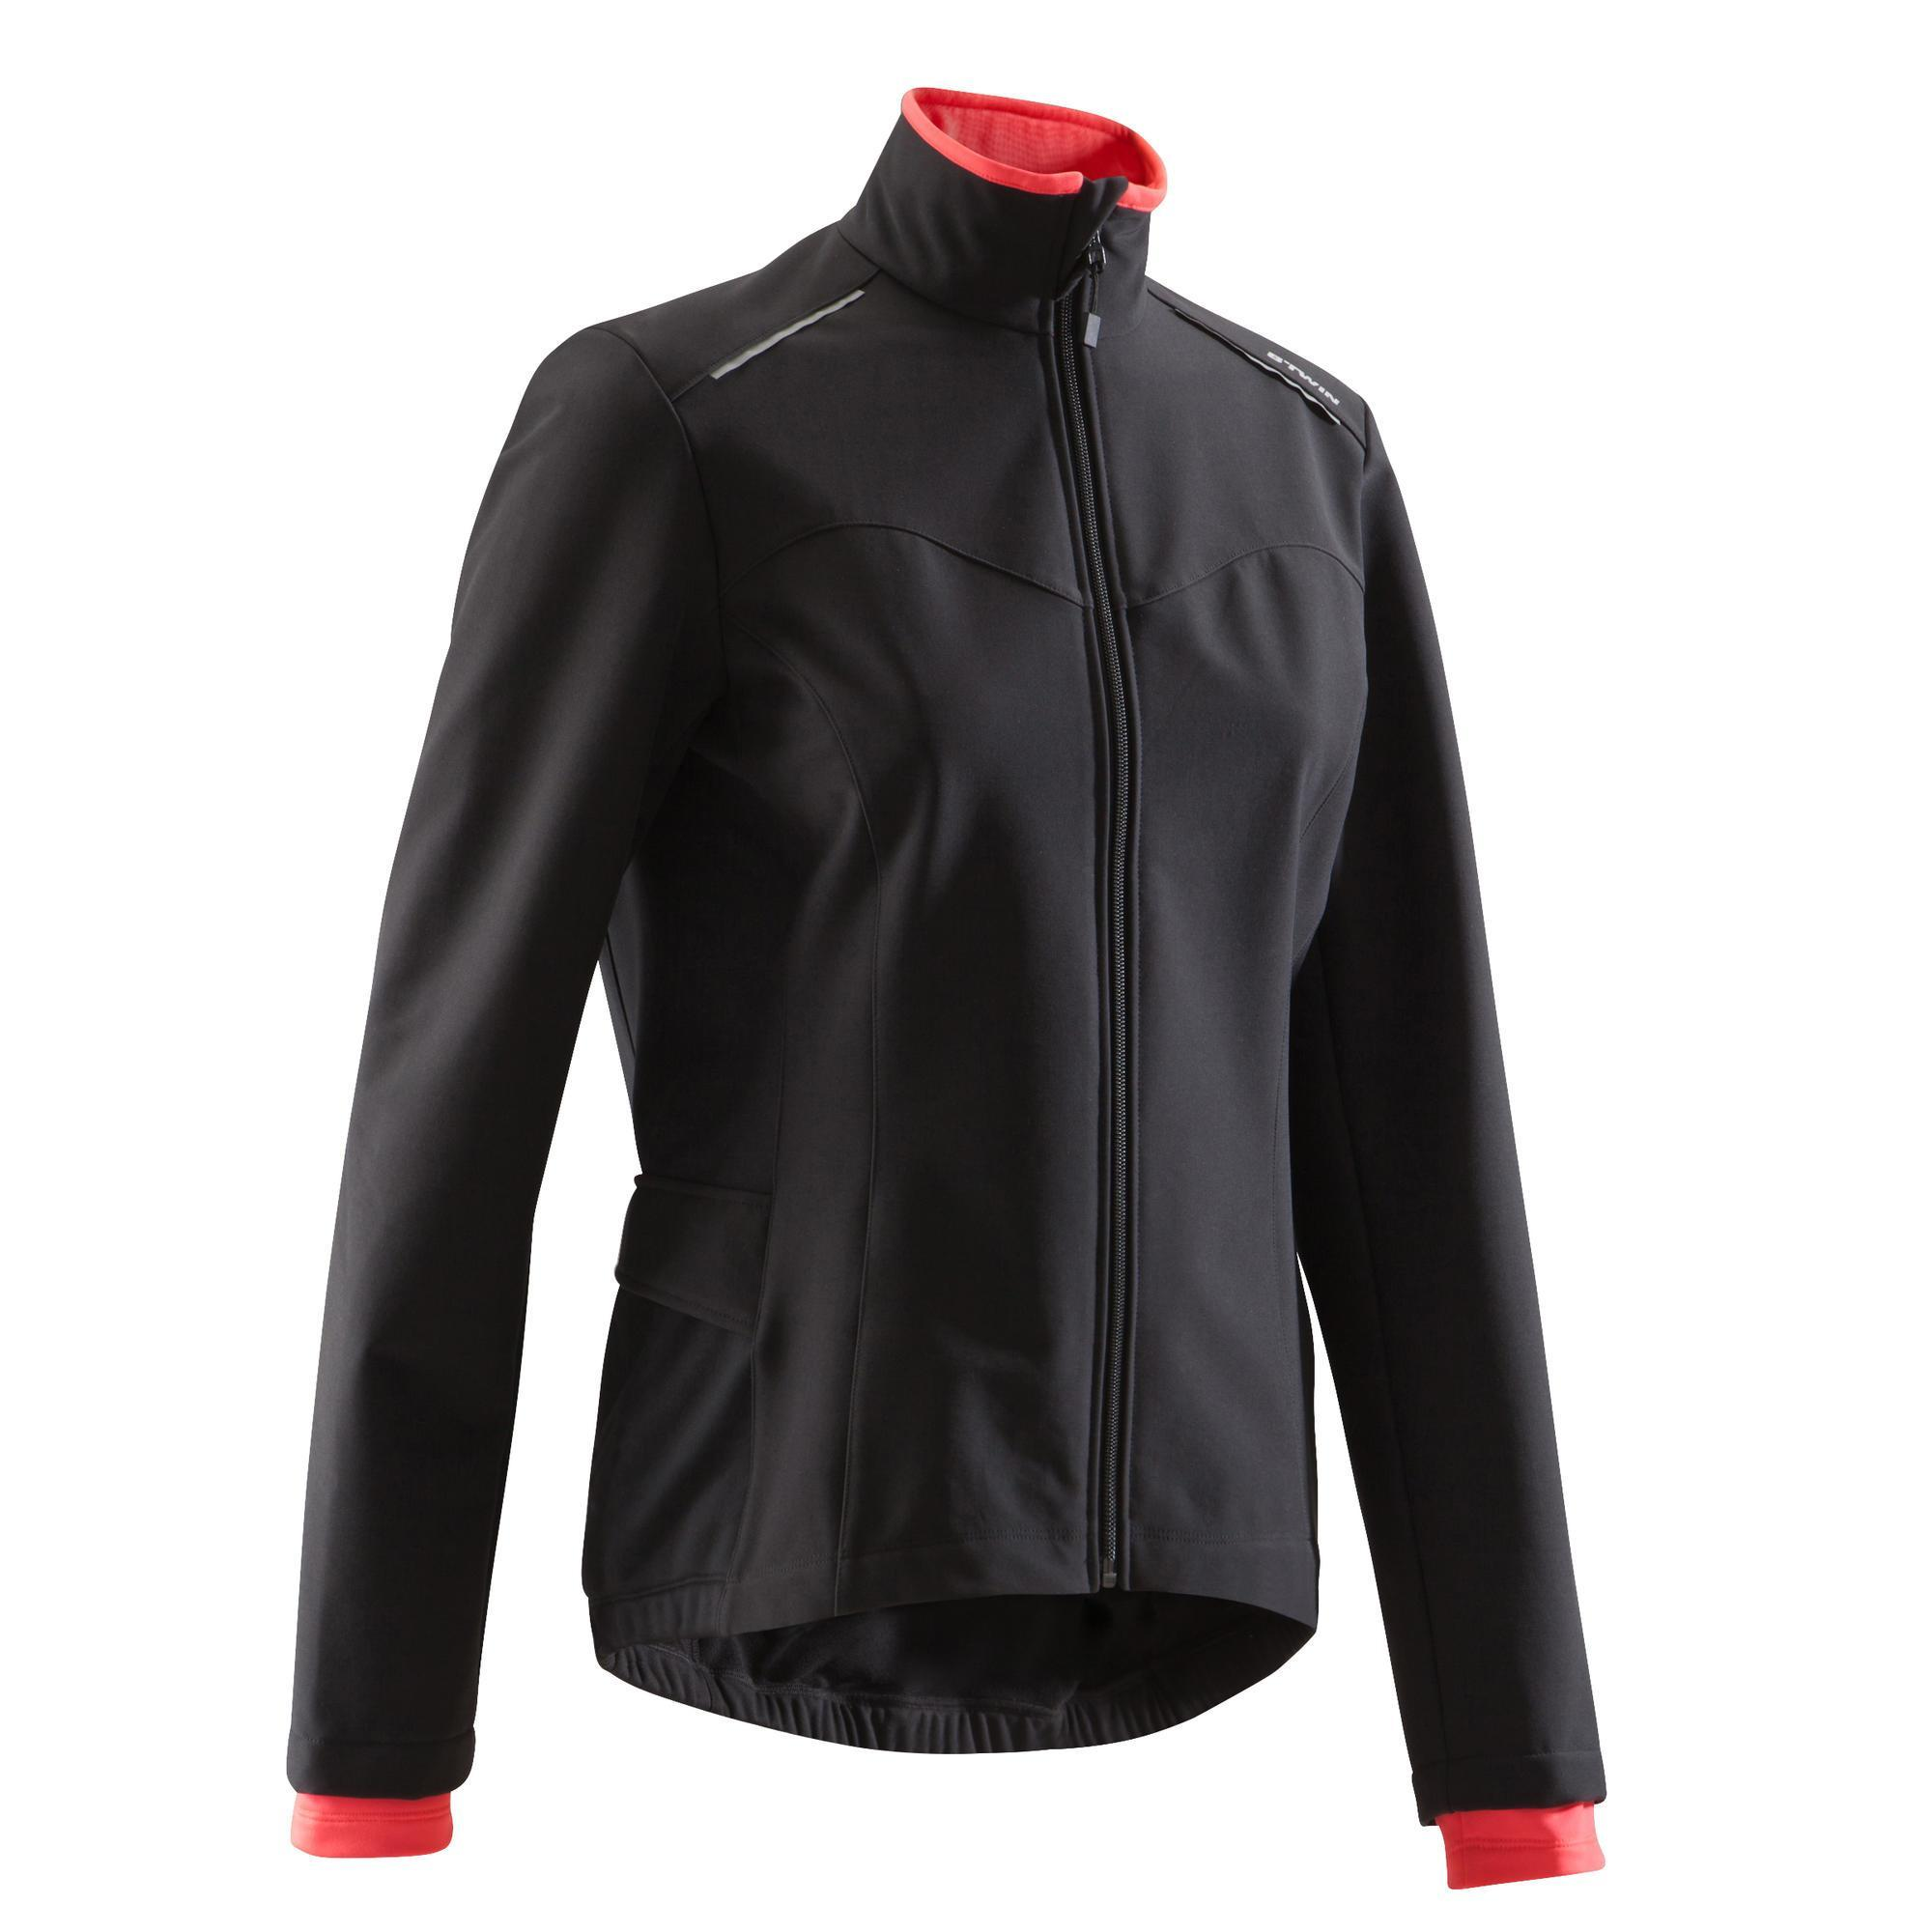 Fahrradjacke 100 Damen schwarz | Sportbekleidung > Sportjacken > Fahrradjacken | Schwarz - Rot - Rosa | B´twin